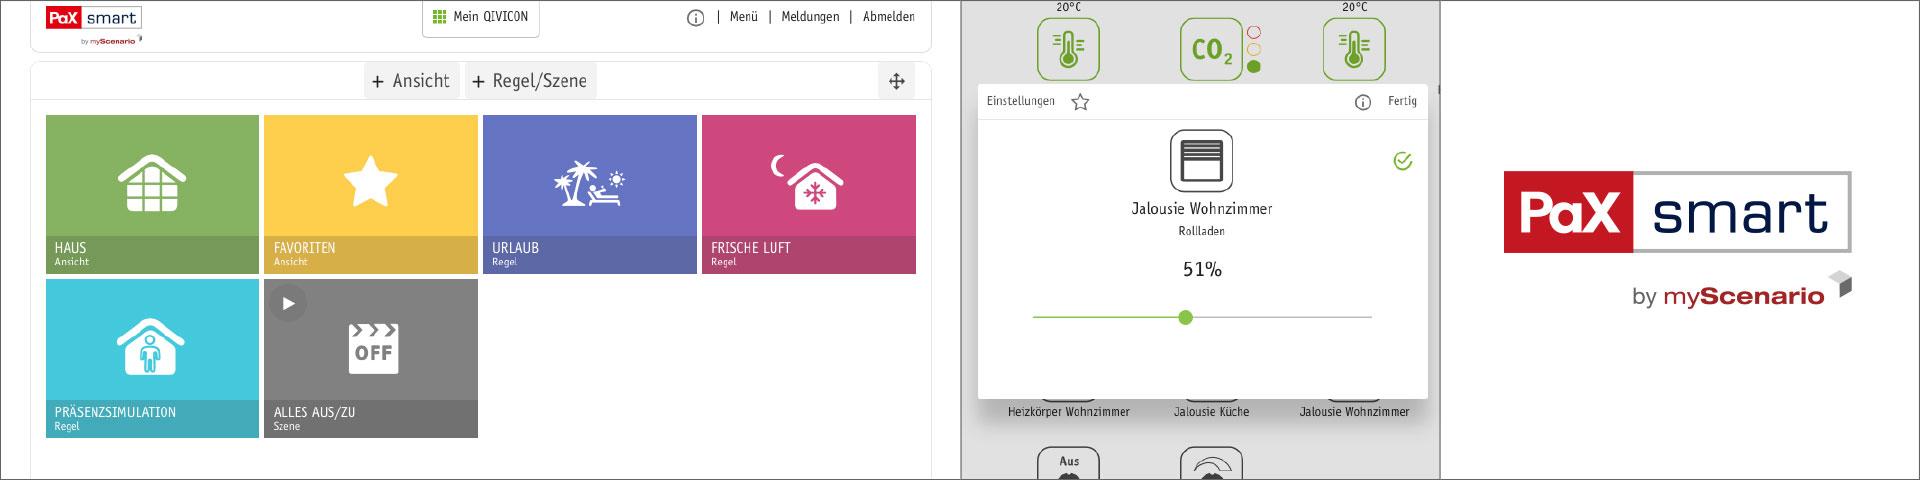 Projekte: Web-App PaXsmart - App-Design